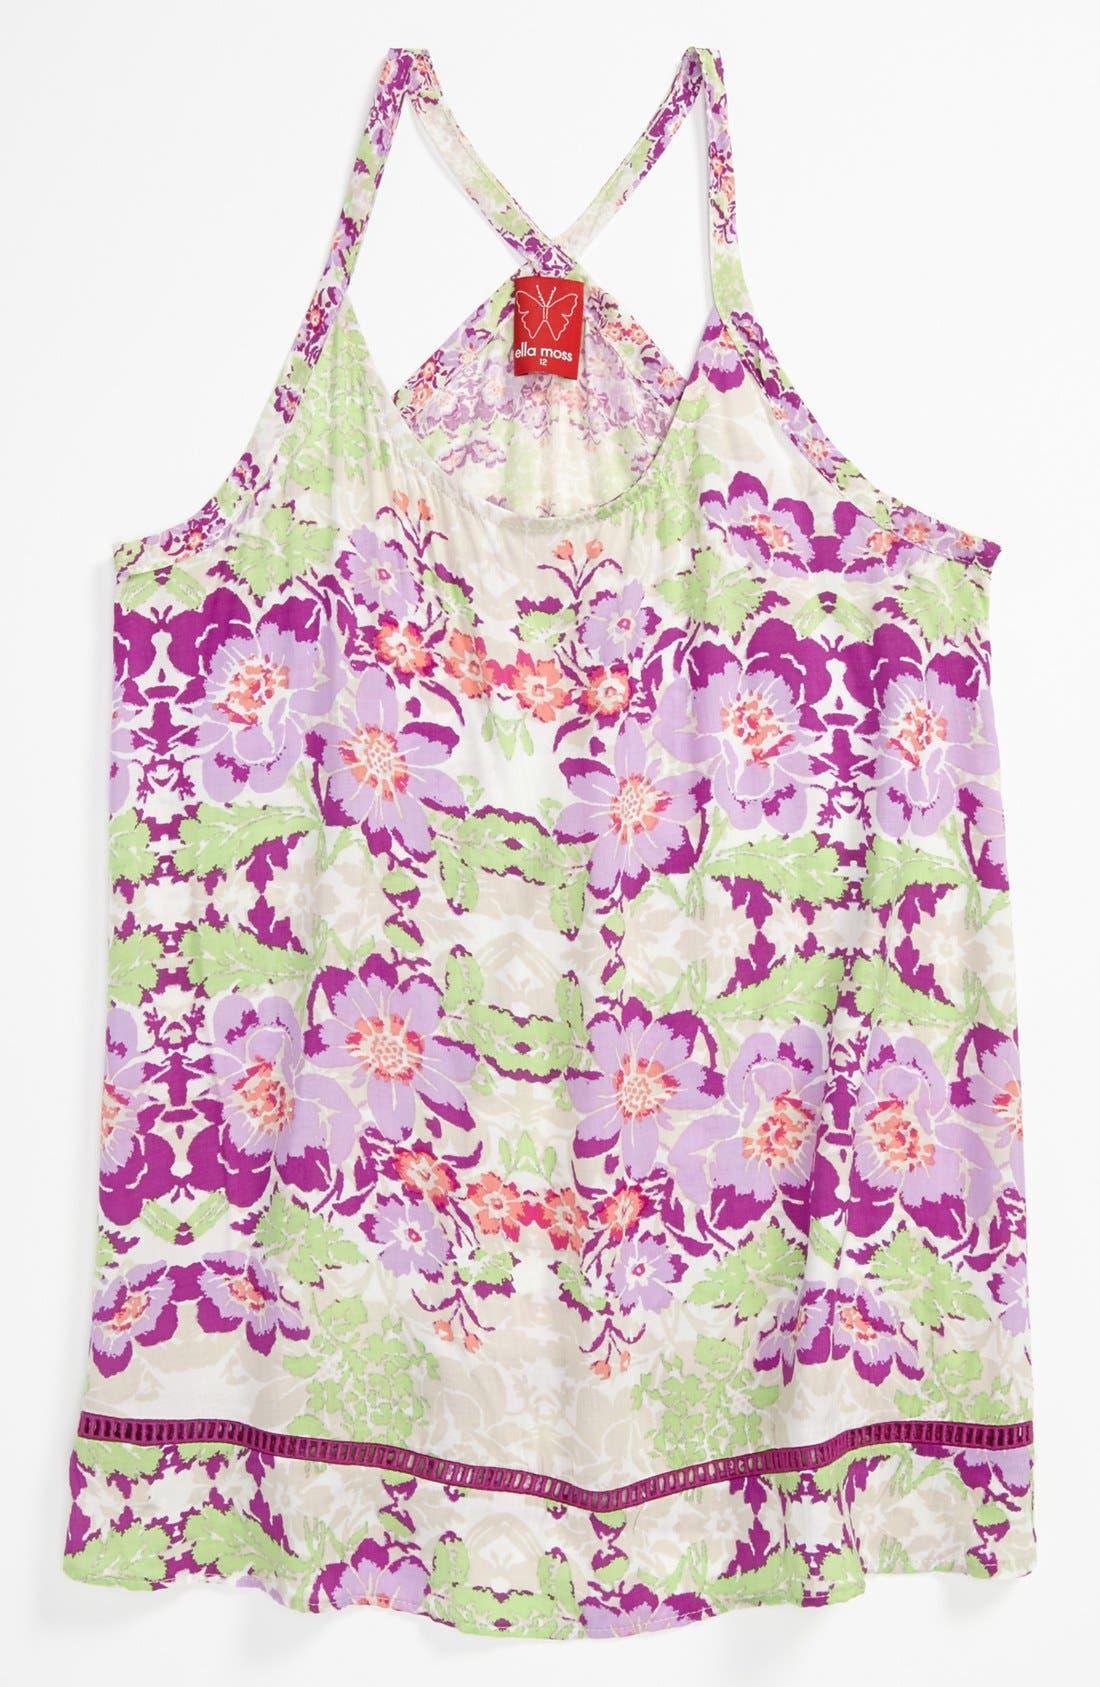 Main Image - Ella Moss 'Floral Lei' Tank Top (Big Girls)